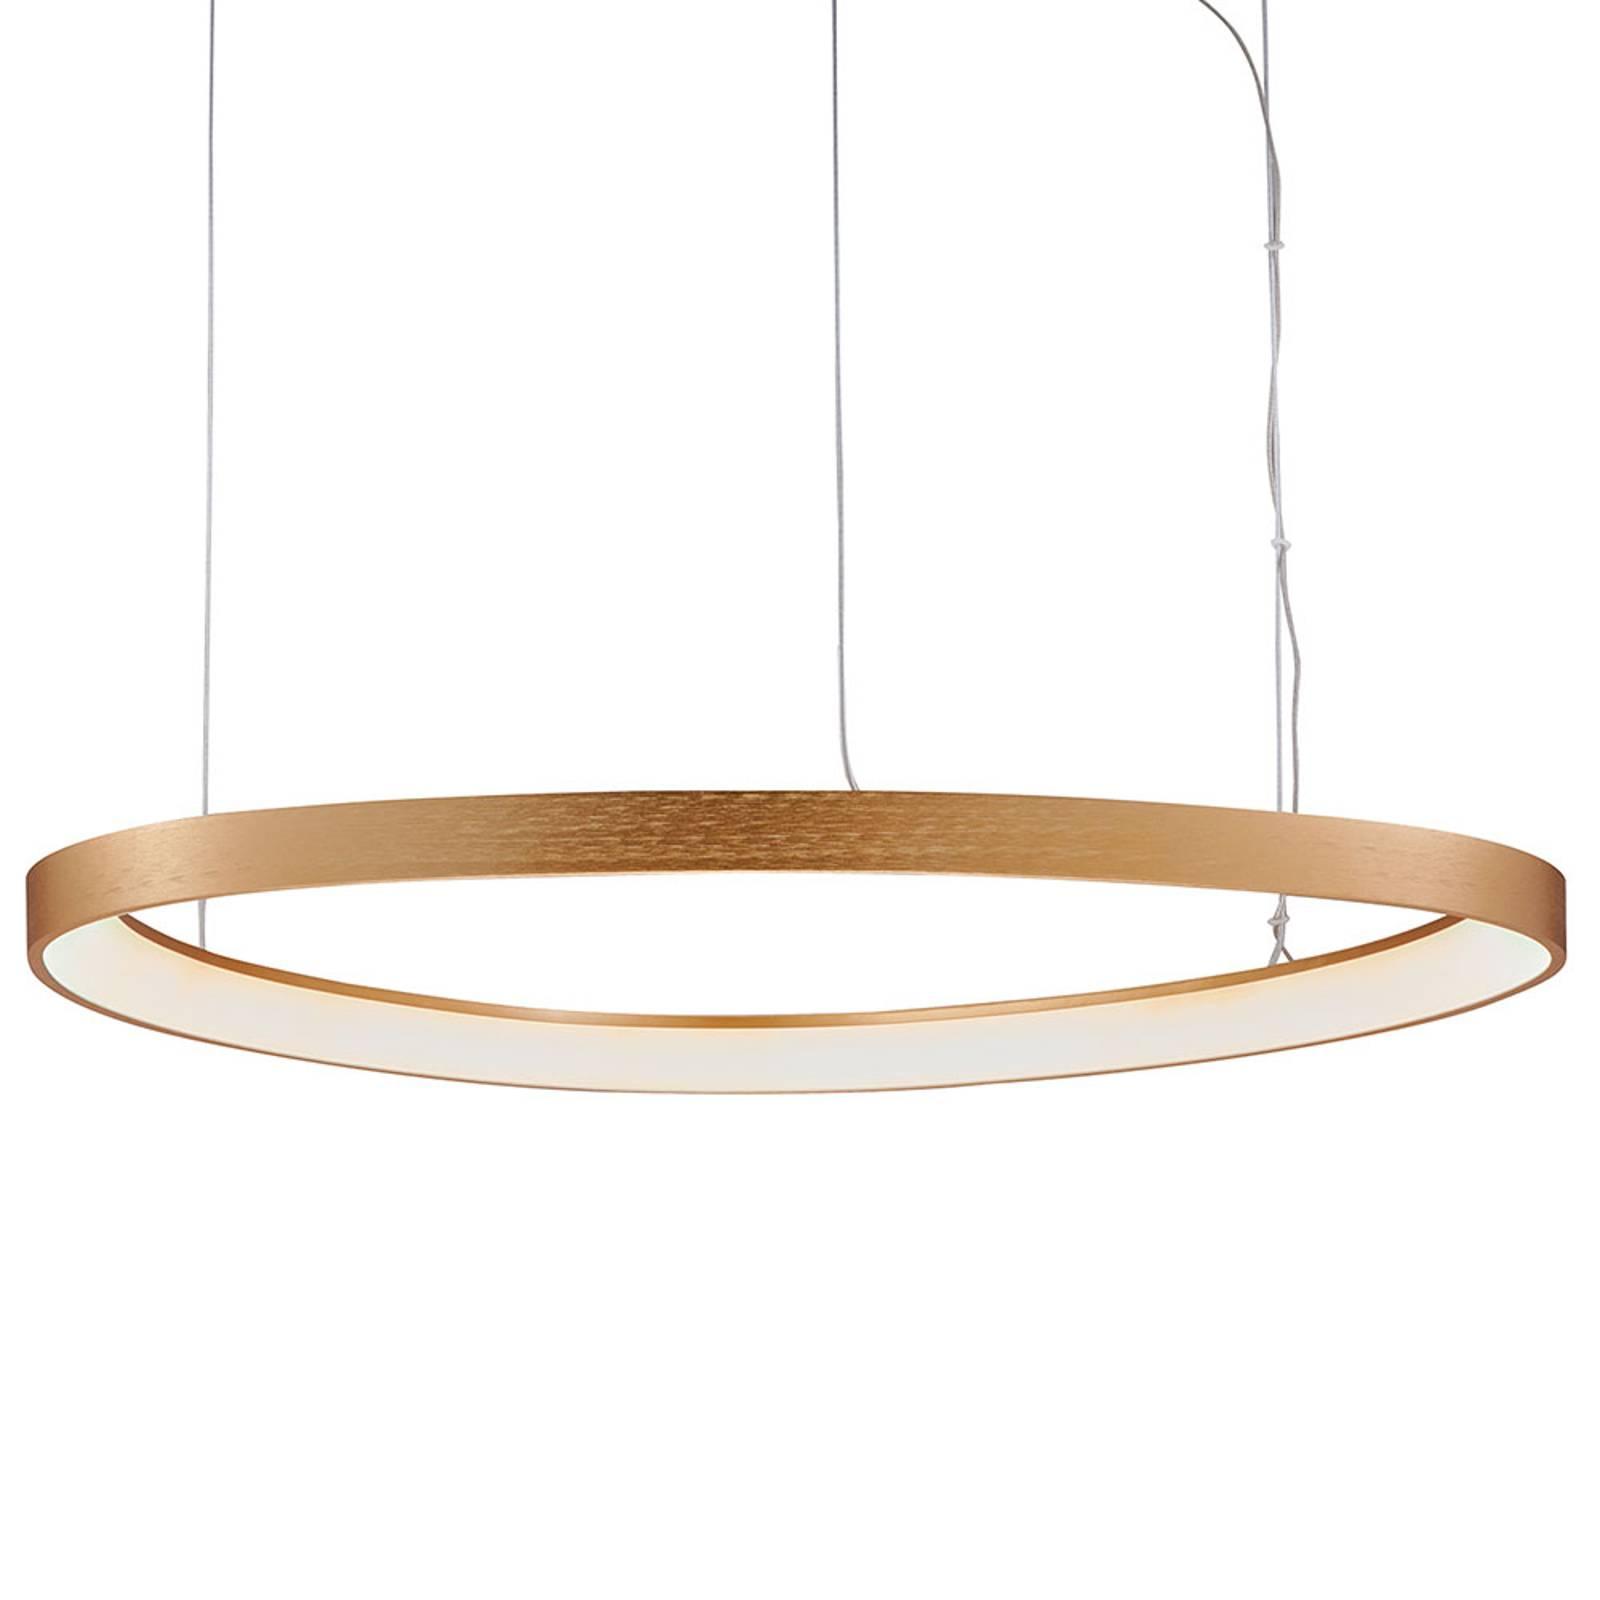 Suspension LED Loop, dorée, Ø 80cm